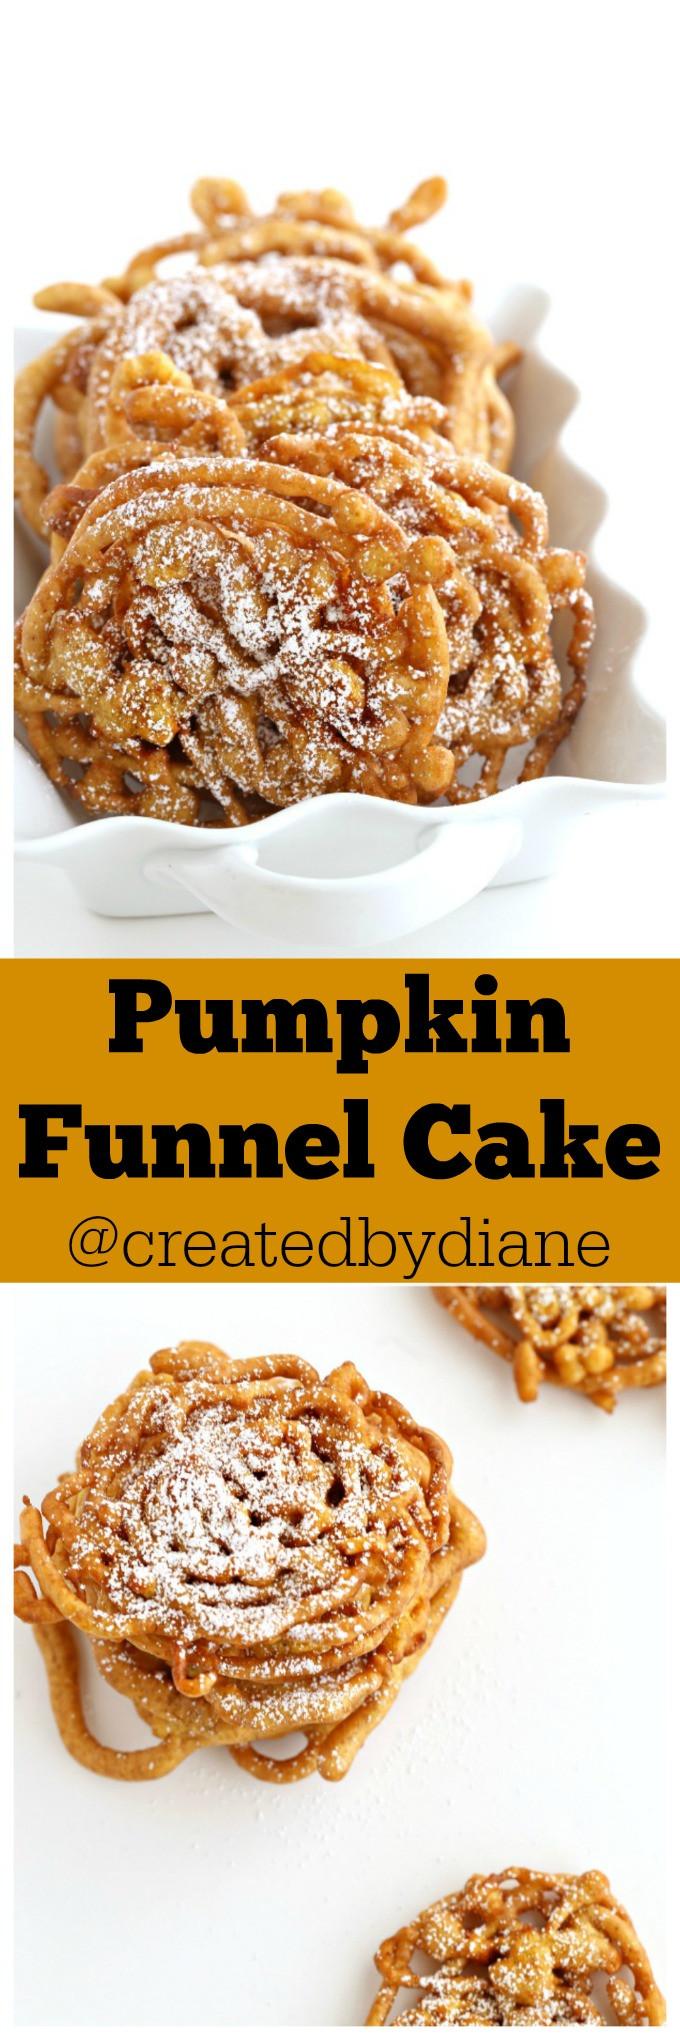 Fall Desserts 2019  Pumpkin Funnel Cake A fall dessert idea